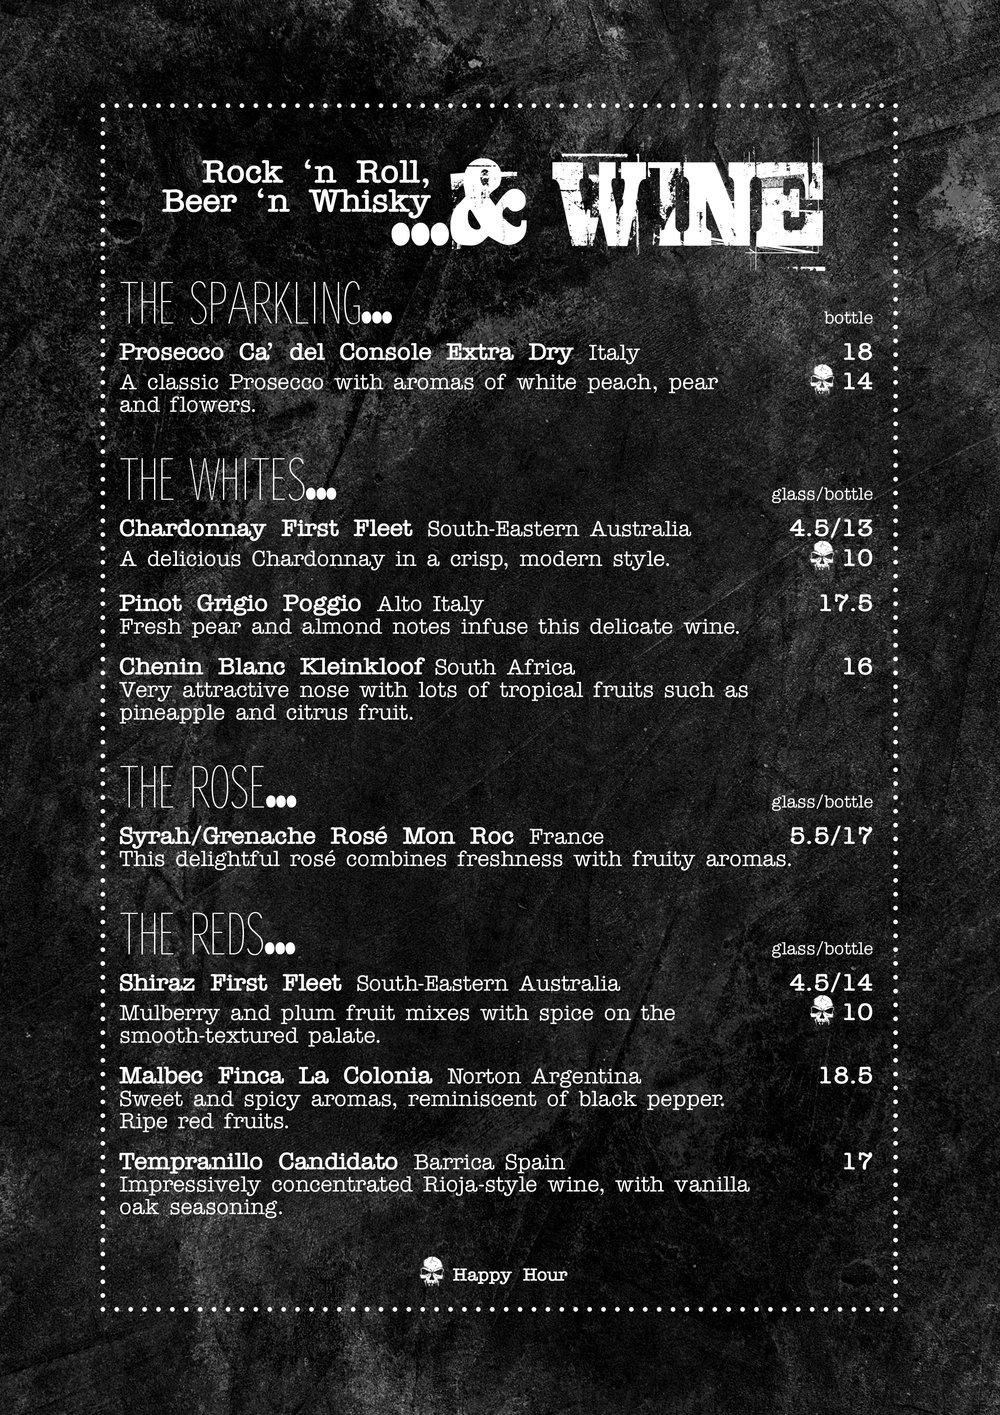 Crobar-wine-menu-July-18-2-EDIT.jpg